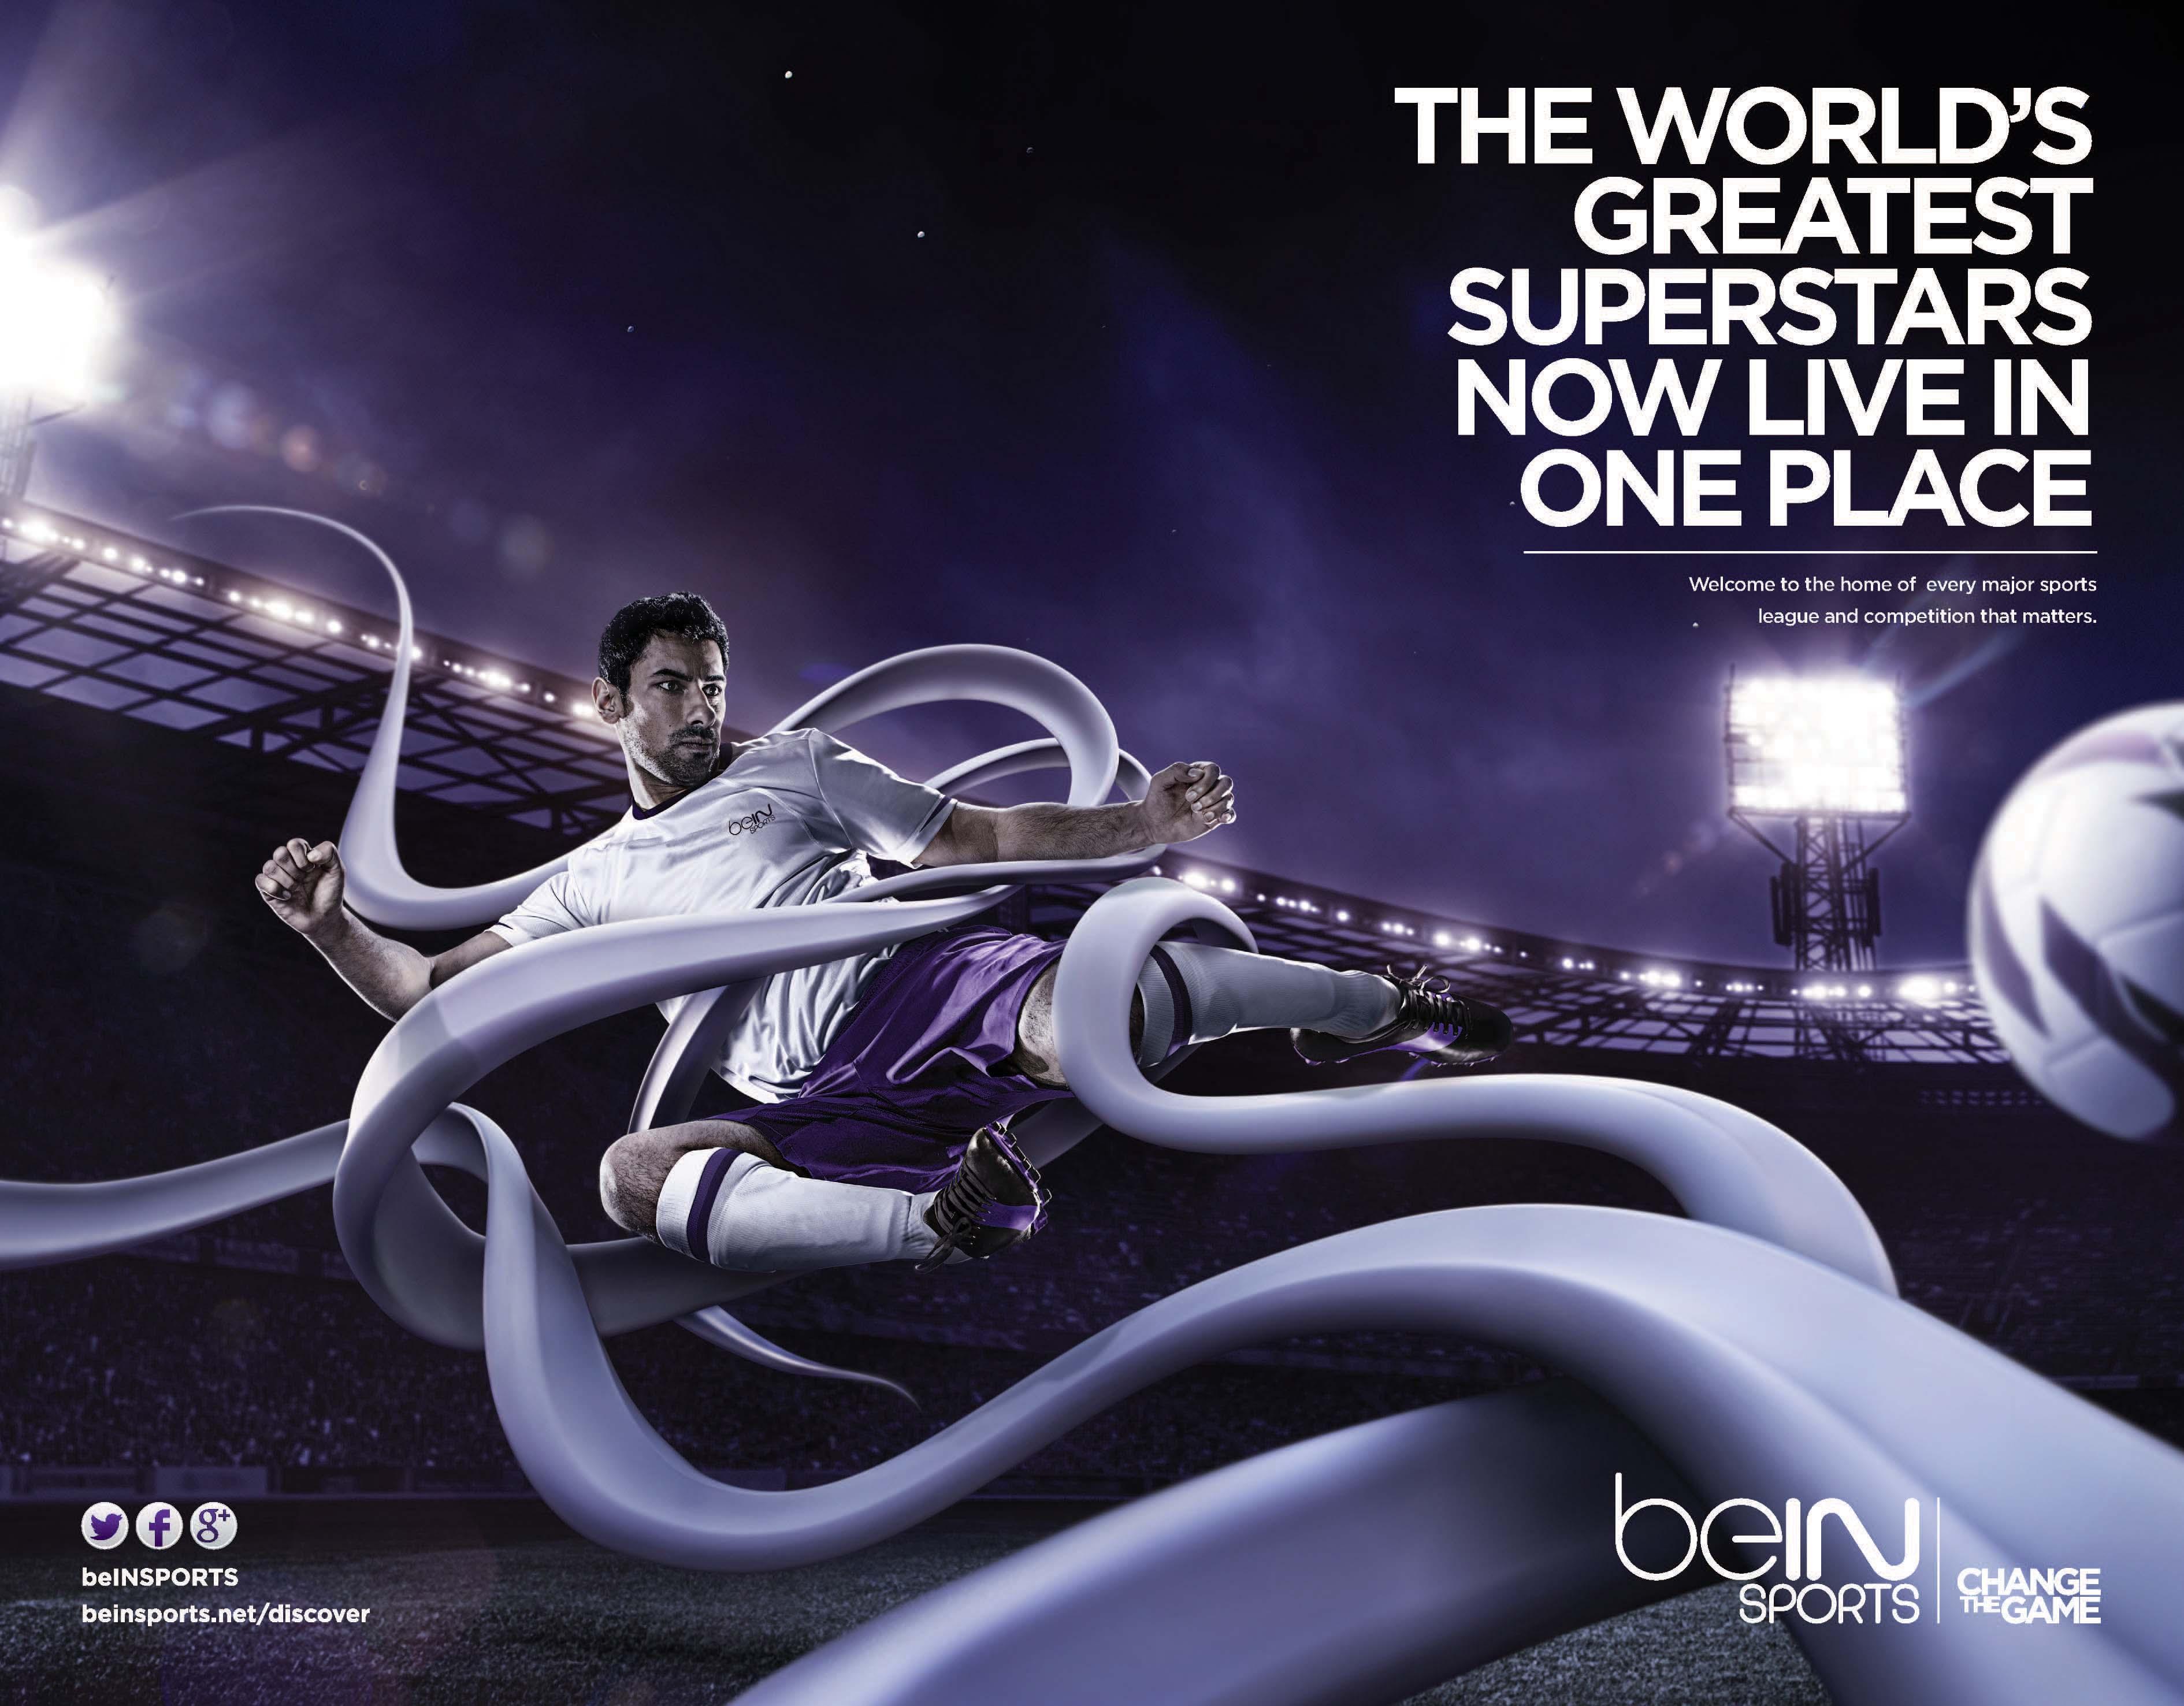 beIN - Football